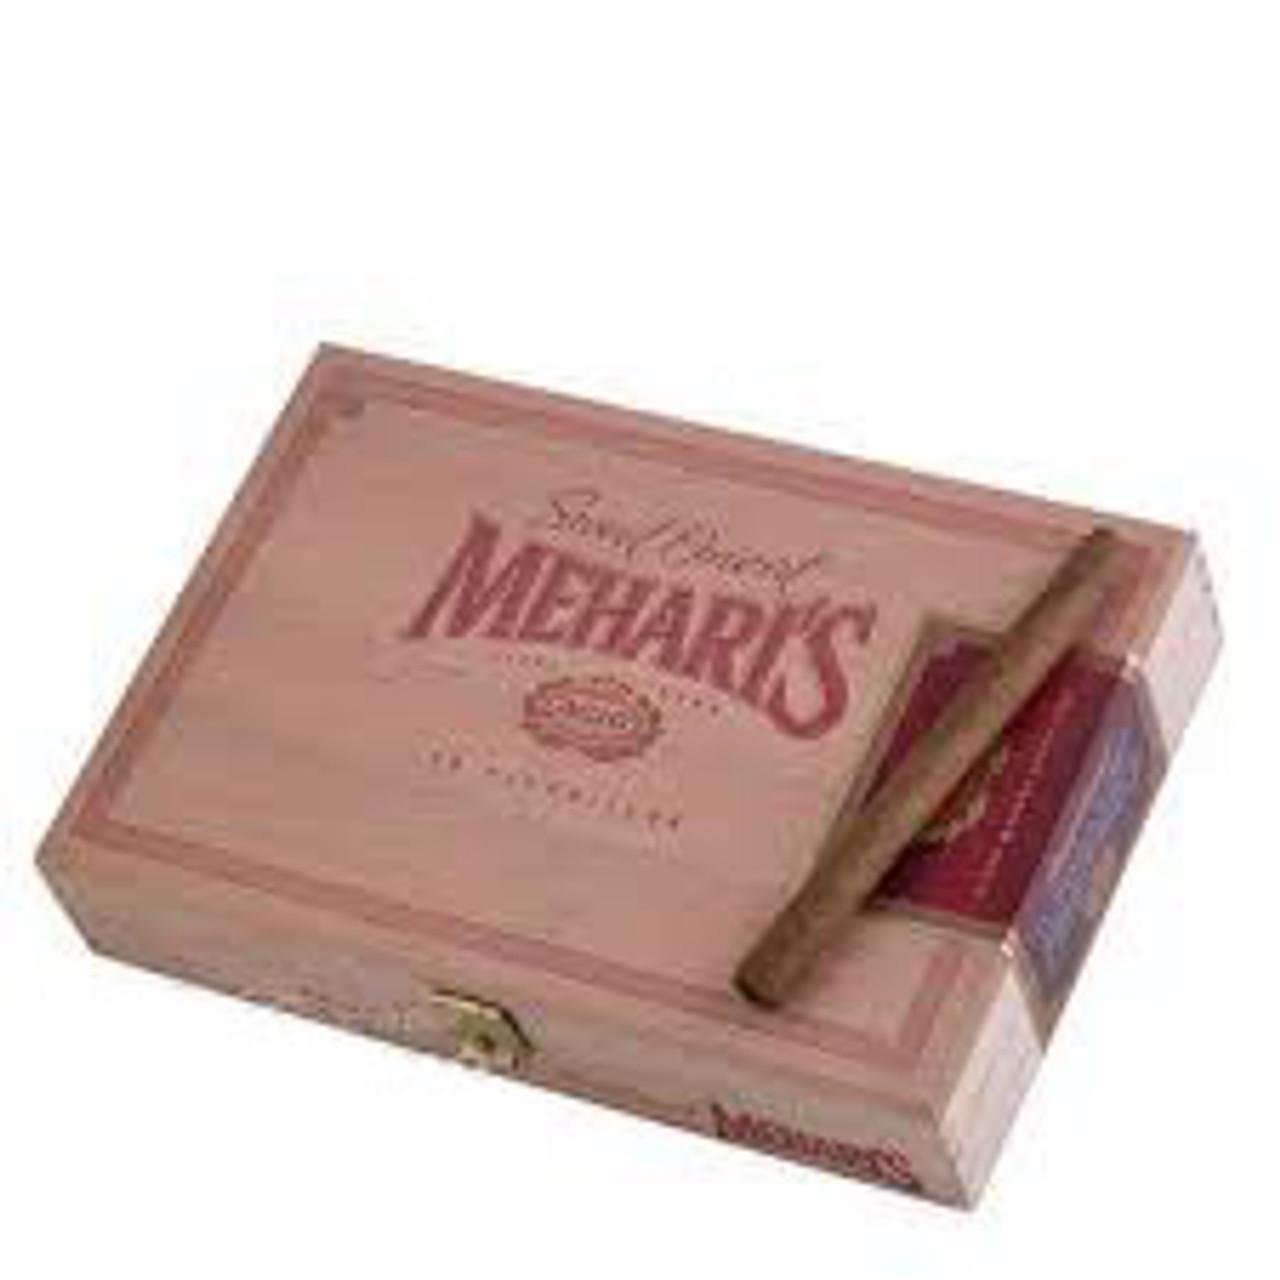 Agio Mehari's Cigarillos Red Orient Cigars - 4 x 22 (Box of 50)